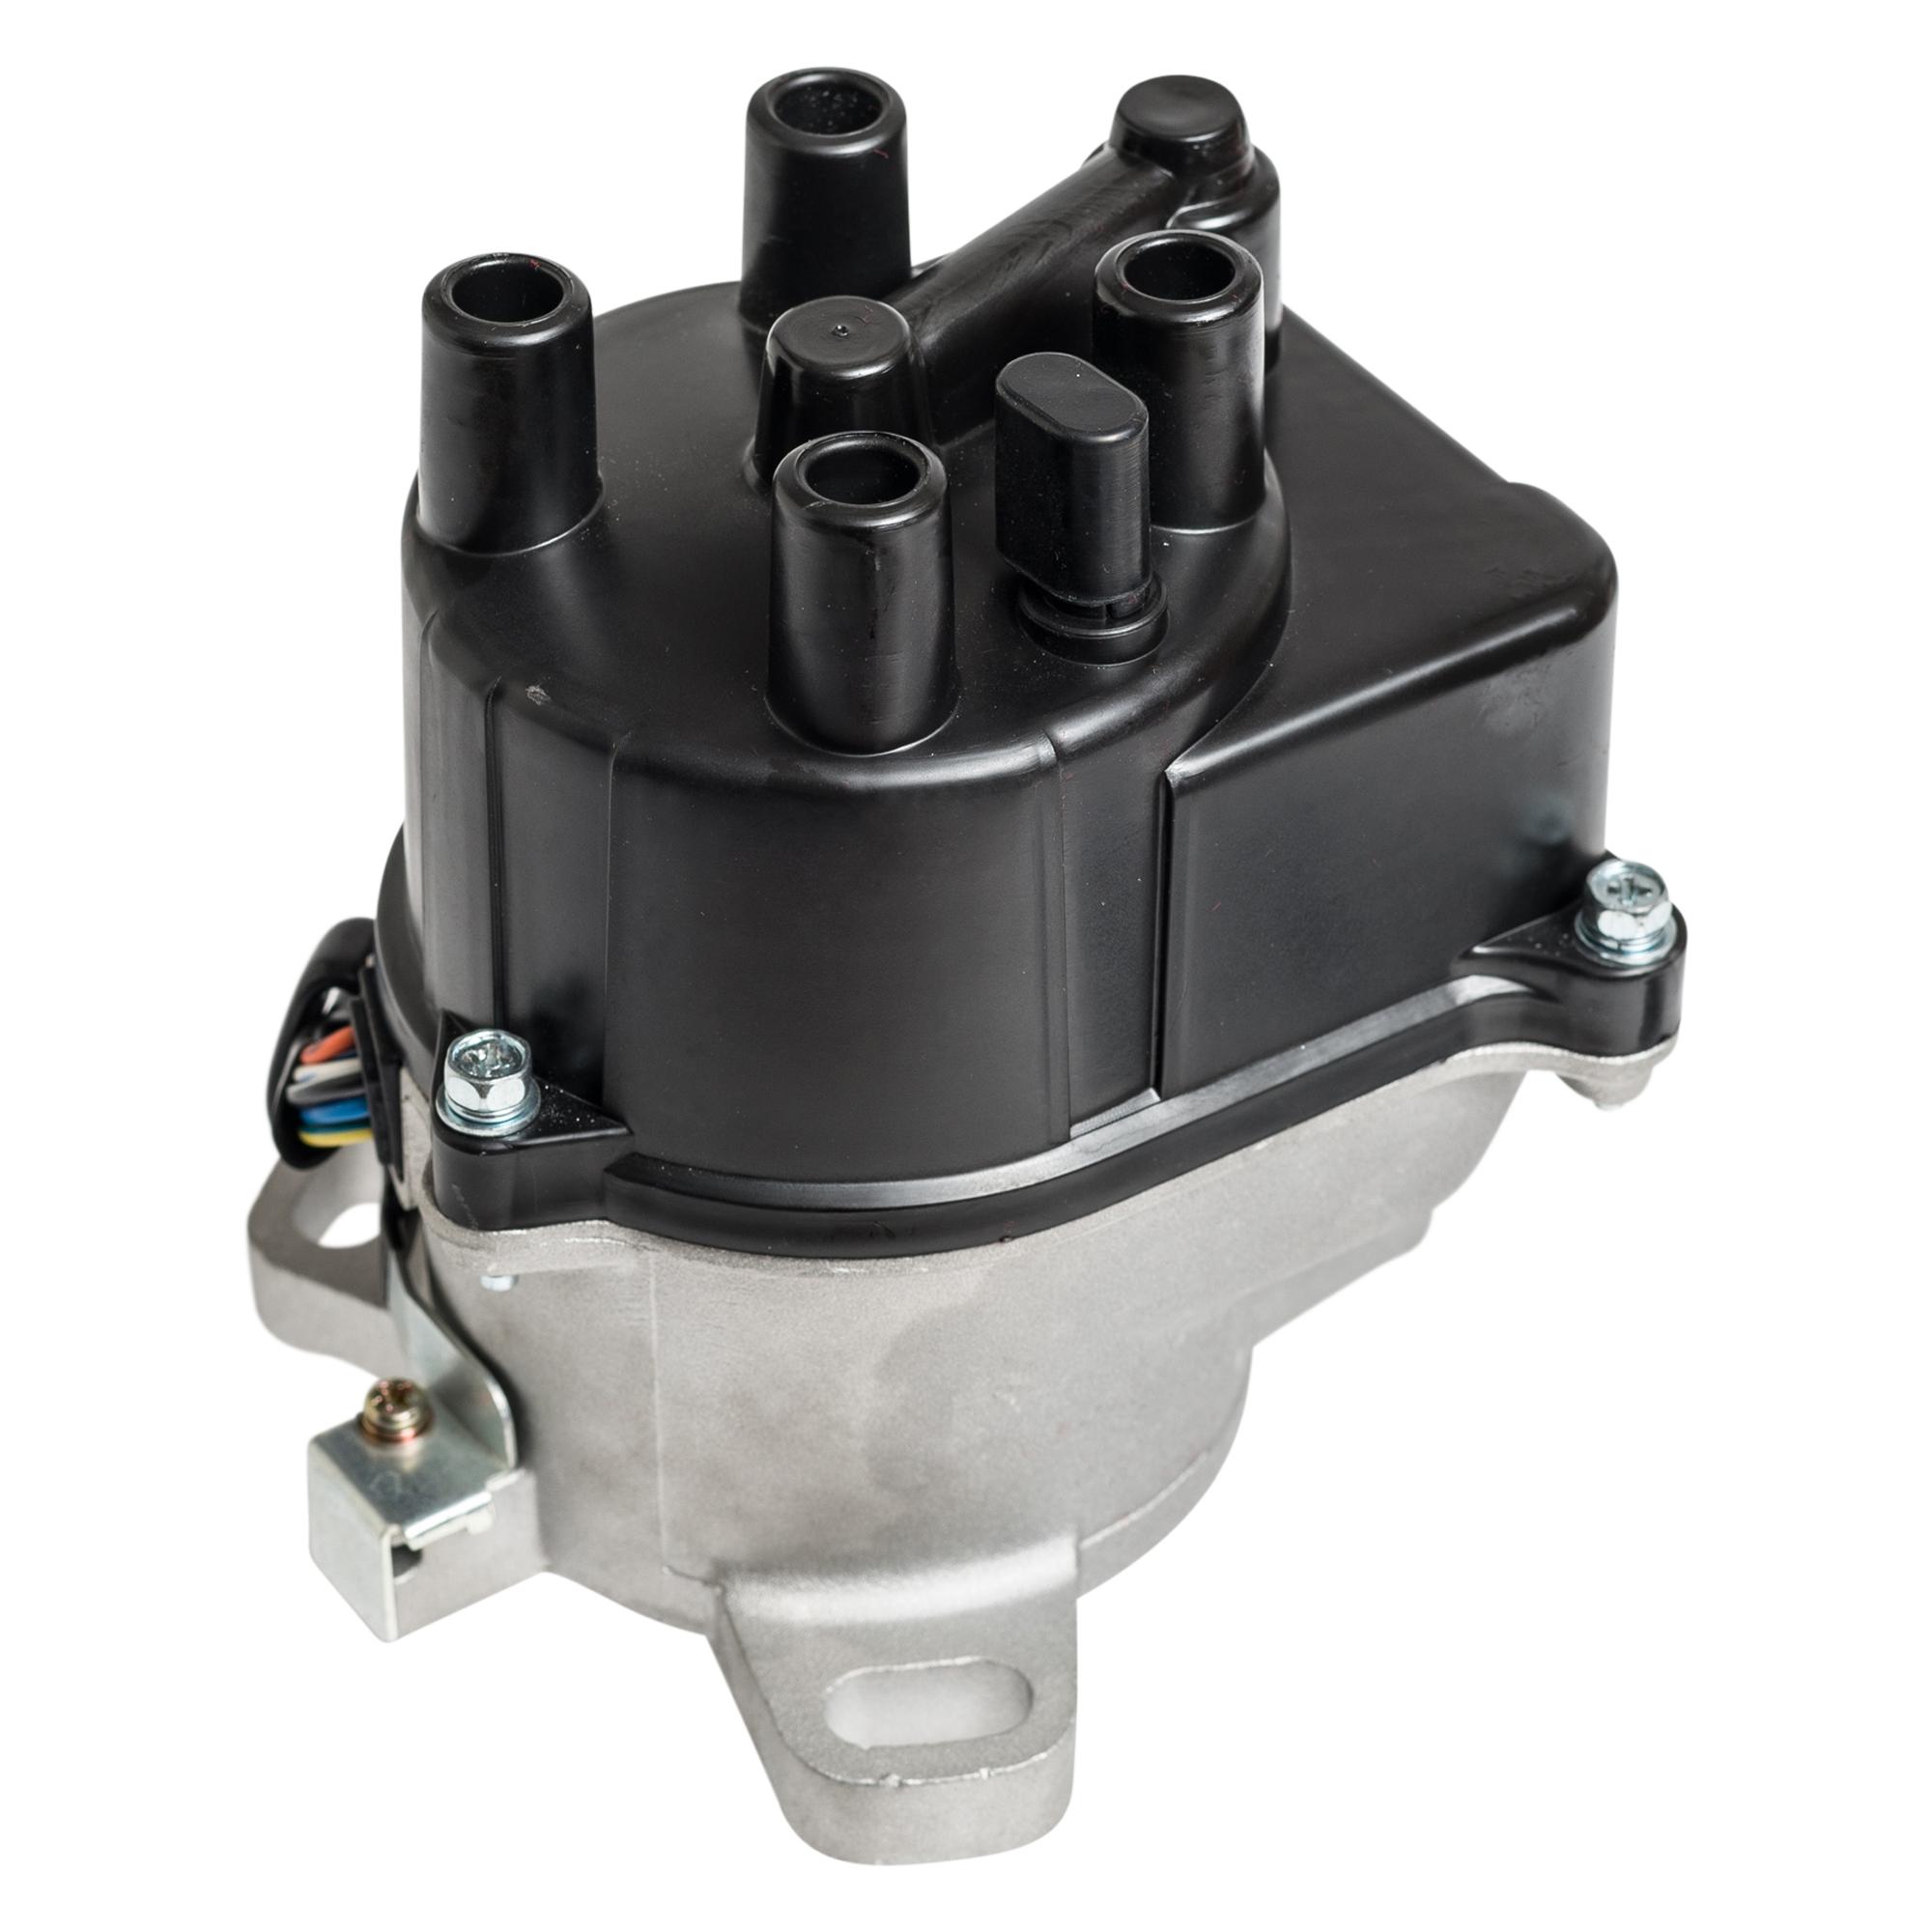 Ignition Distributor For 96-01 Acura Integra 1.8L L4 DOHC